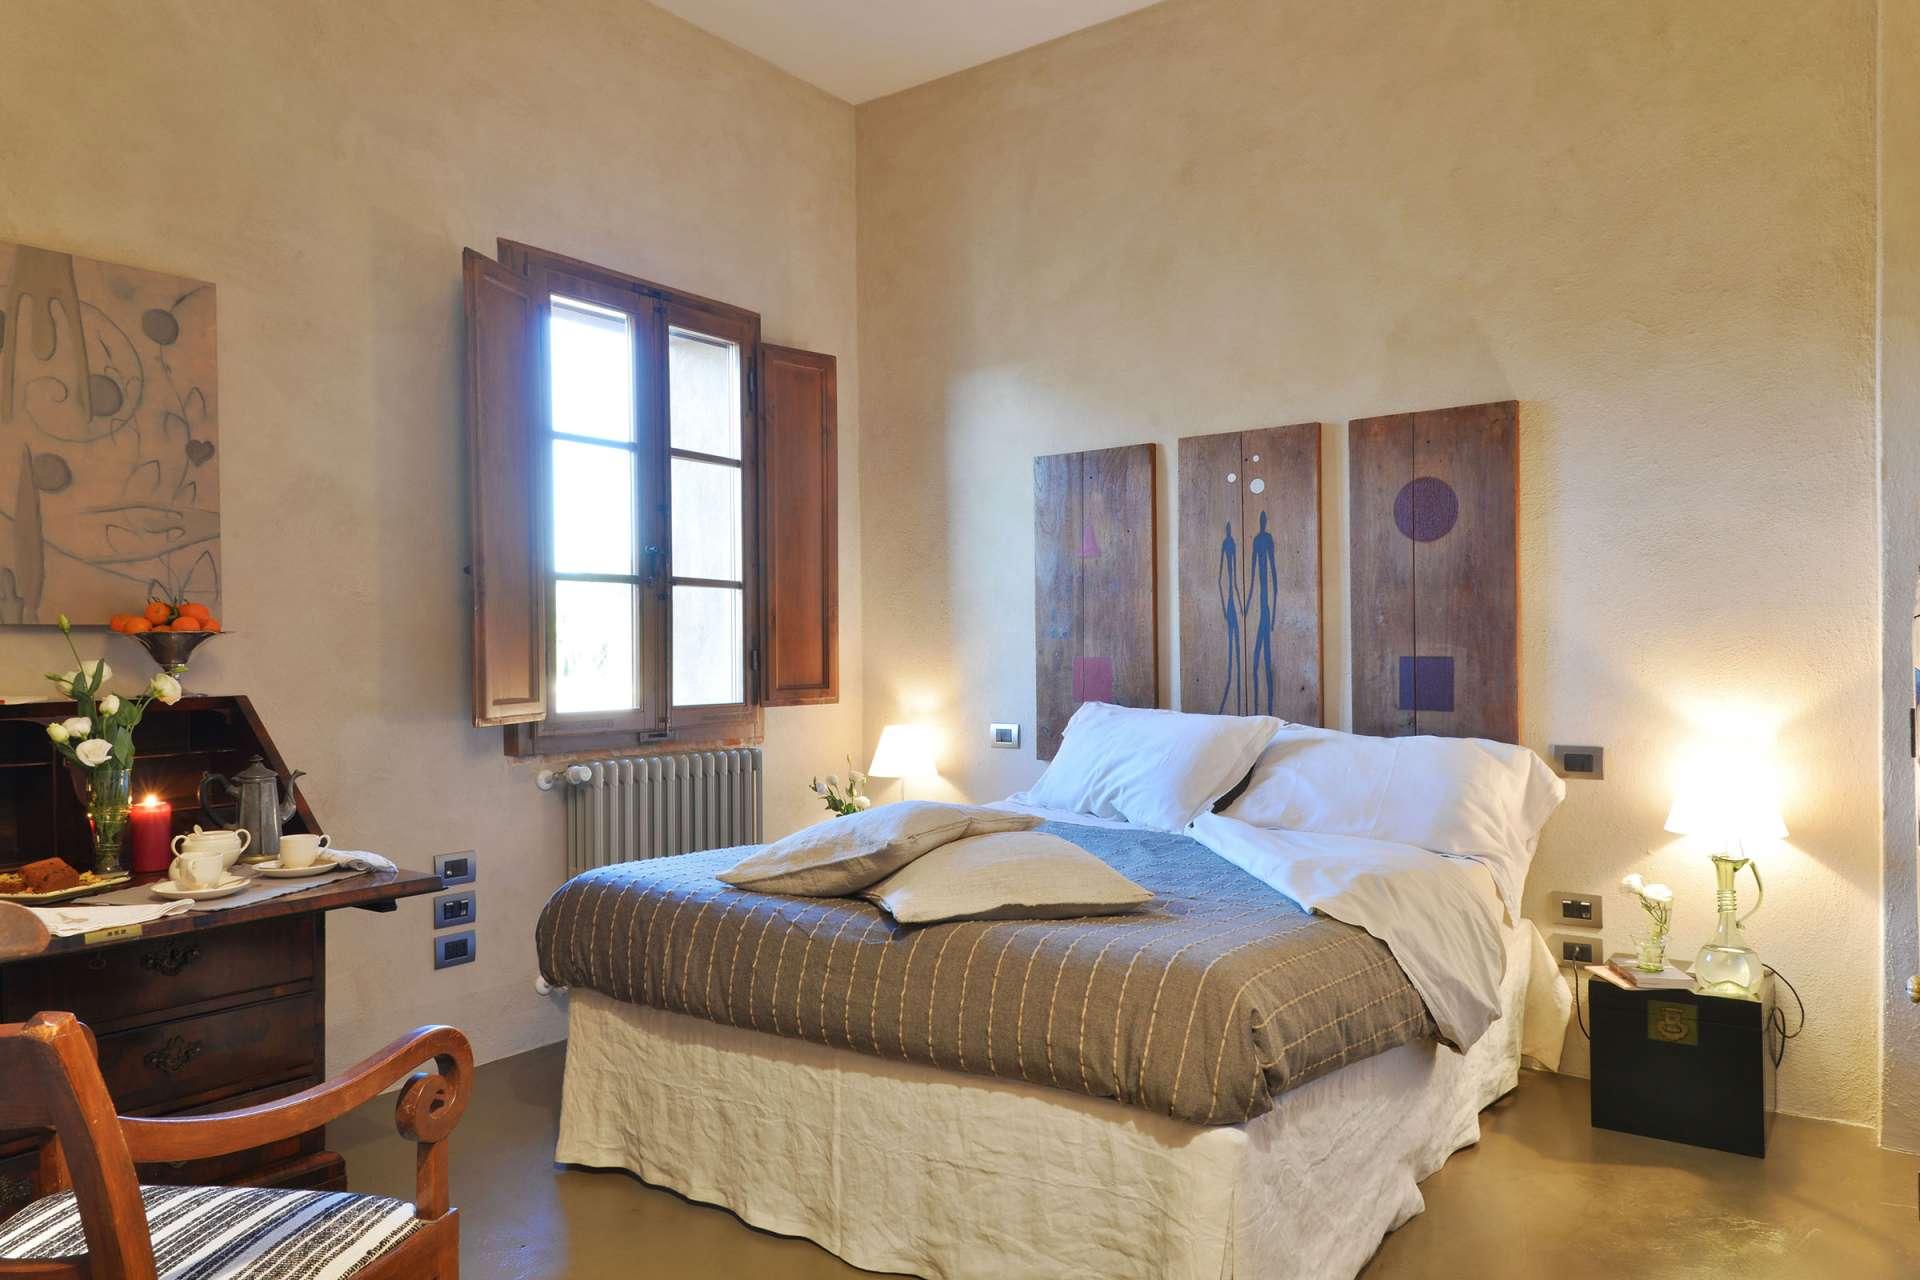 Santa Dieci 5 Bed Luxury Villa With Pool Siena Tuscany Now